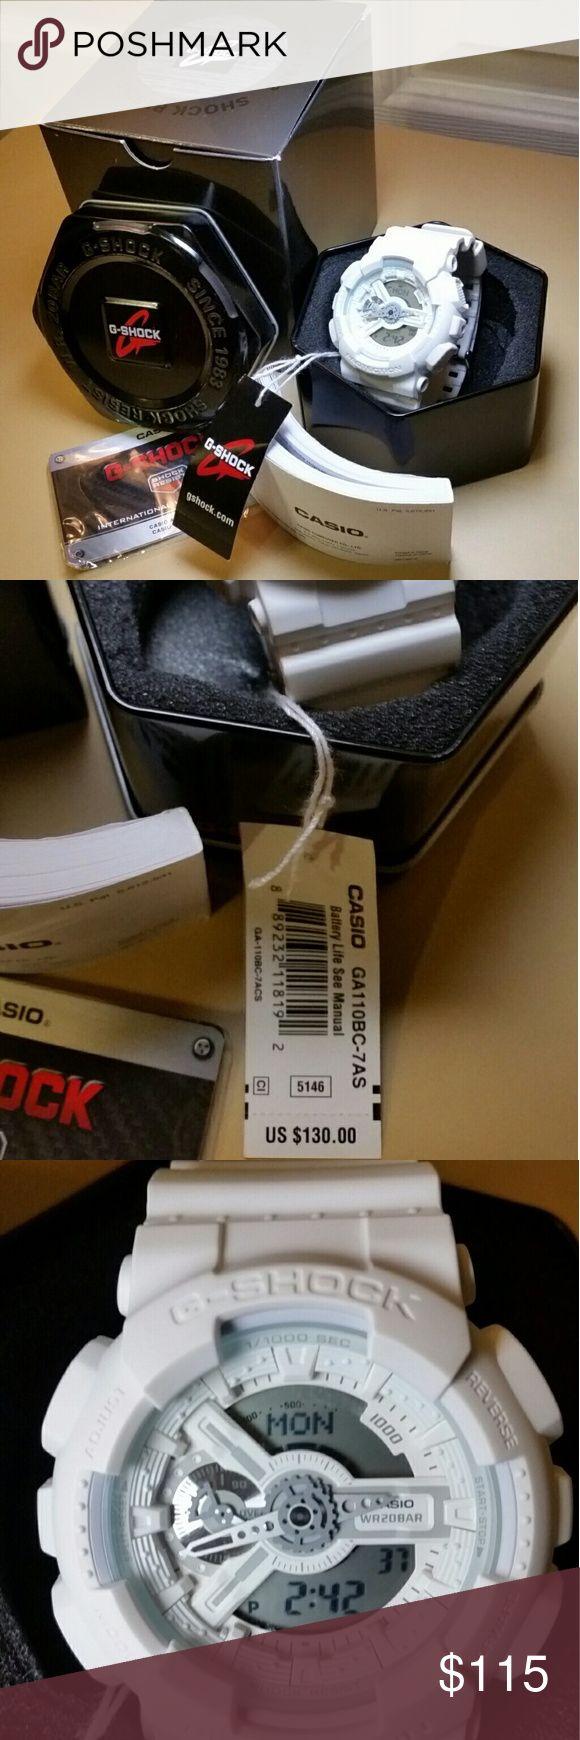 Lutron Maestro 300watt Singlepole Digital Dimmer And Timer Switch